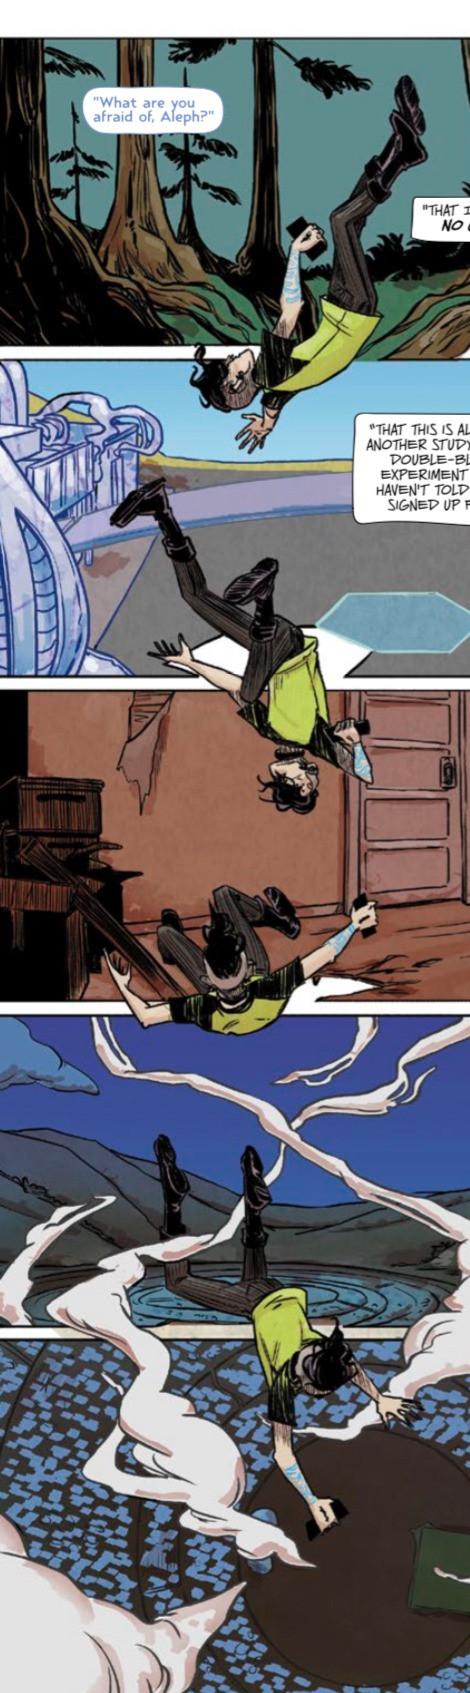 Test, issue #4, Vault Comics, Sebela/Hickman